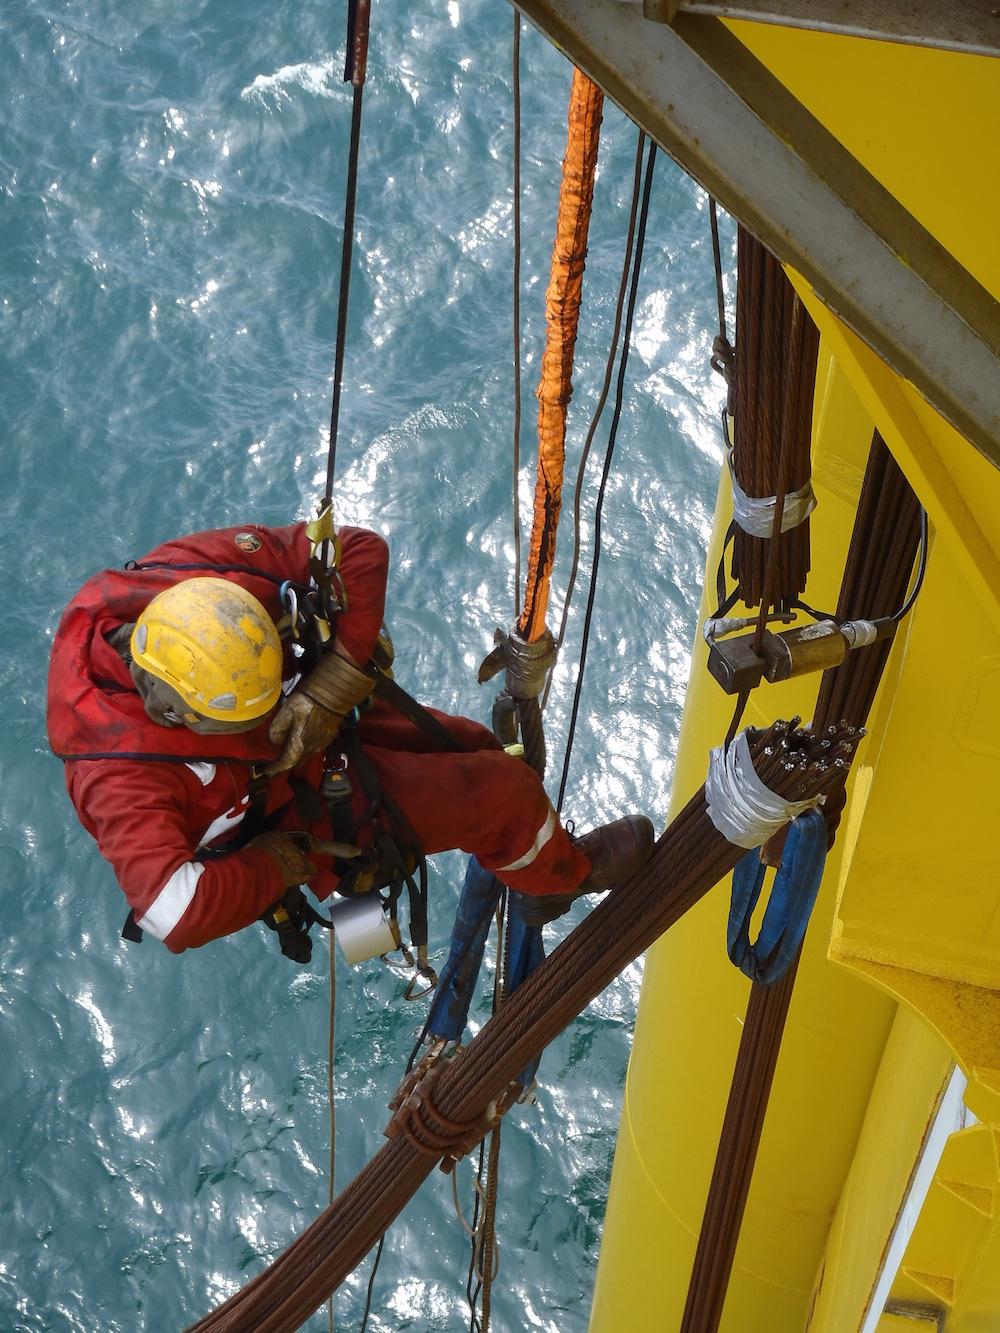 Rope access cost savings